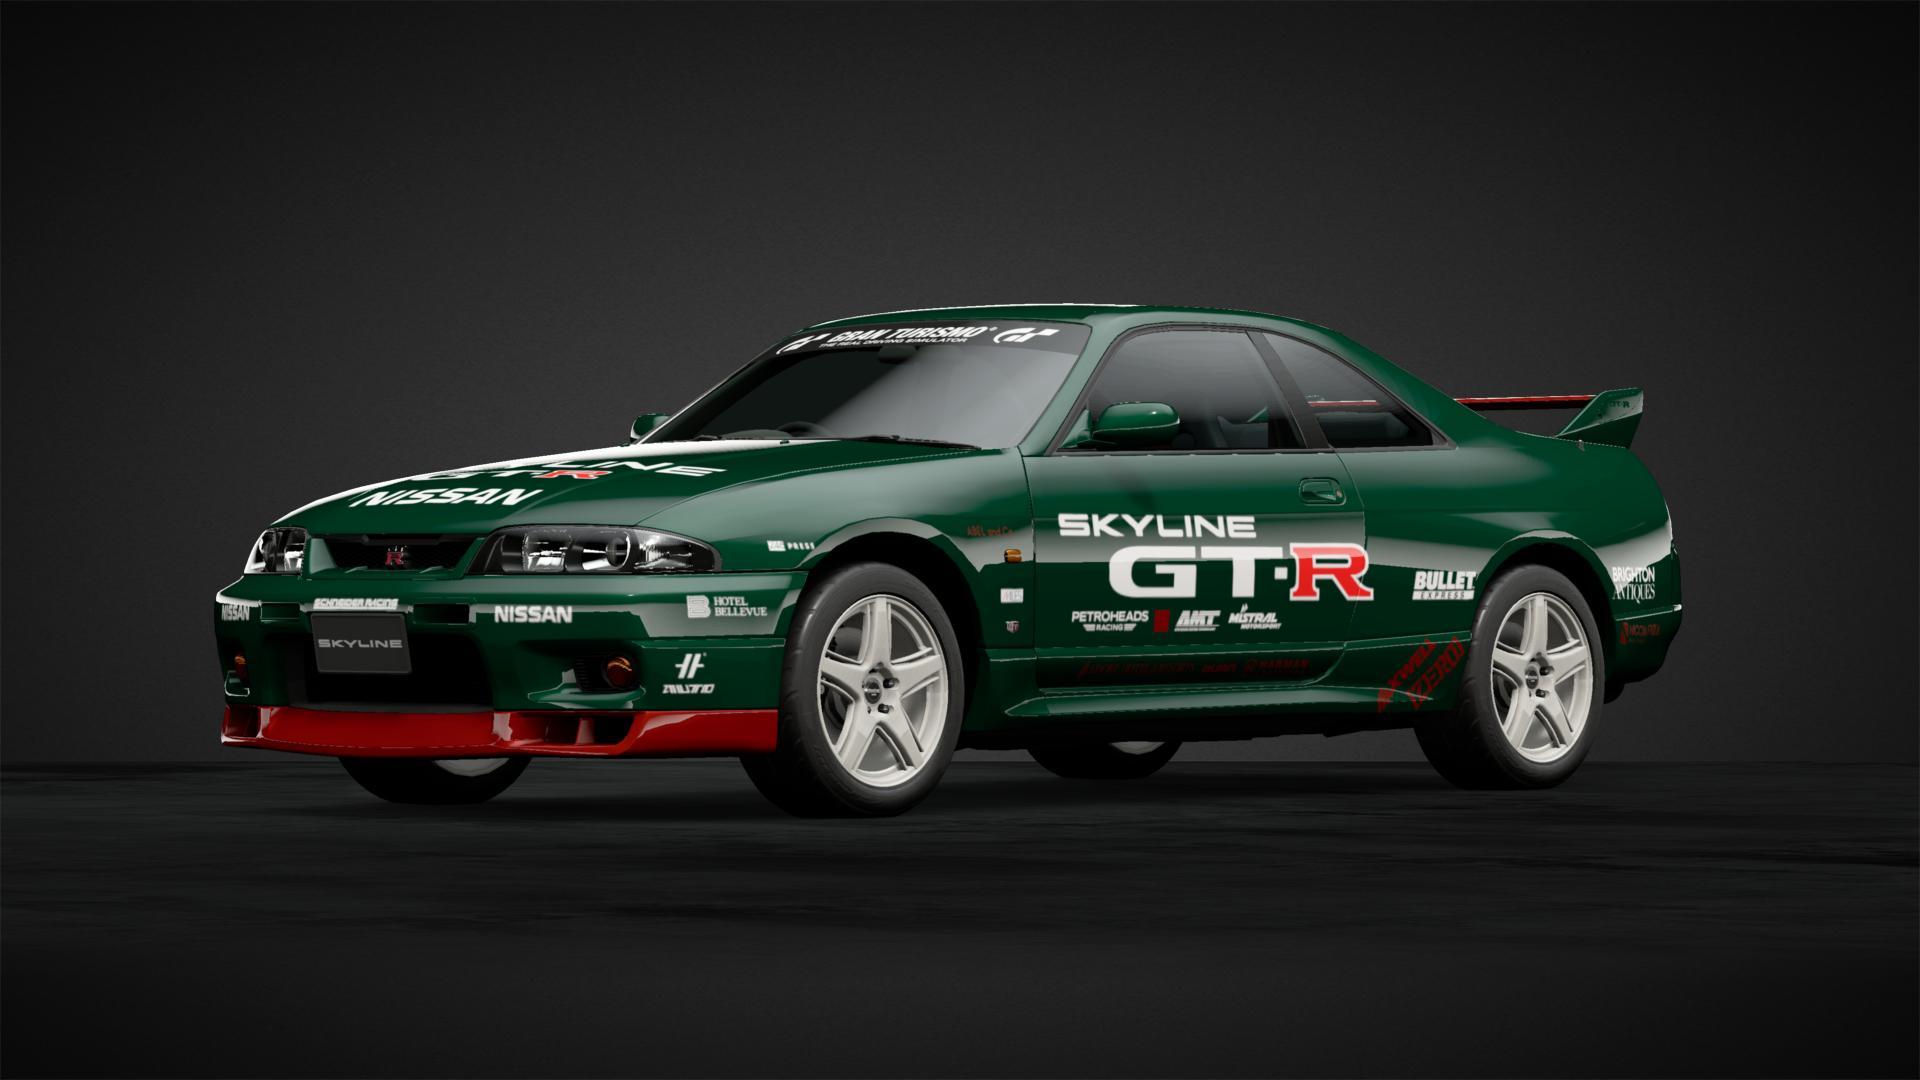 Gt1 race mod 4 car livery by theblackheadcrab community gran turismo sport